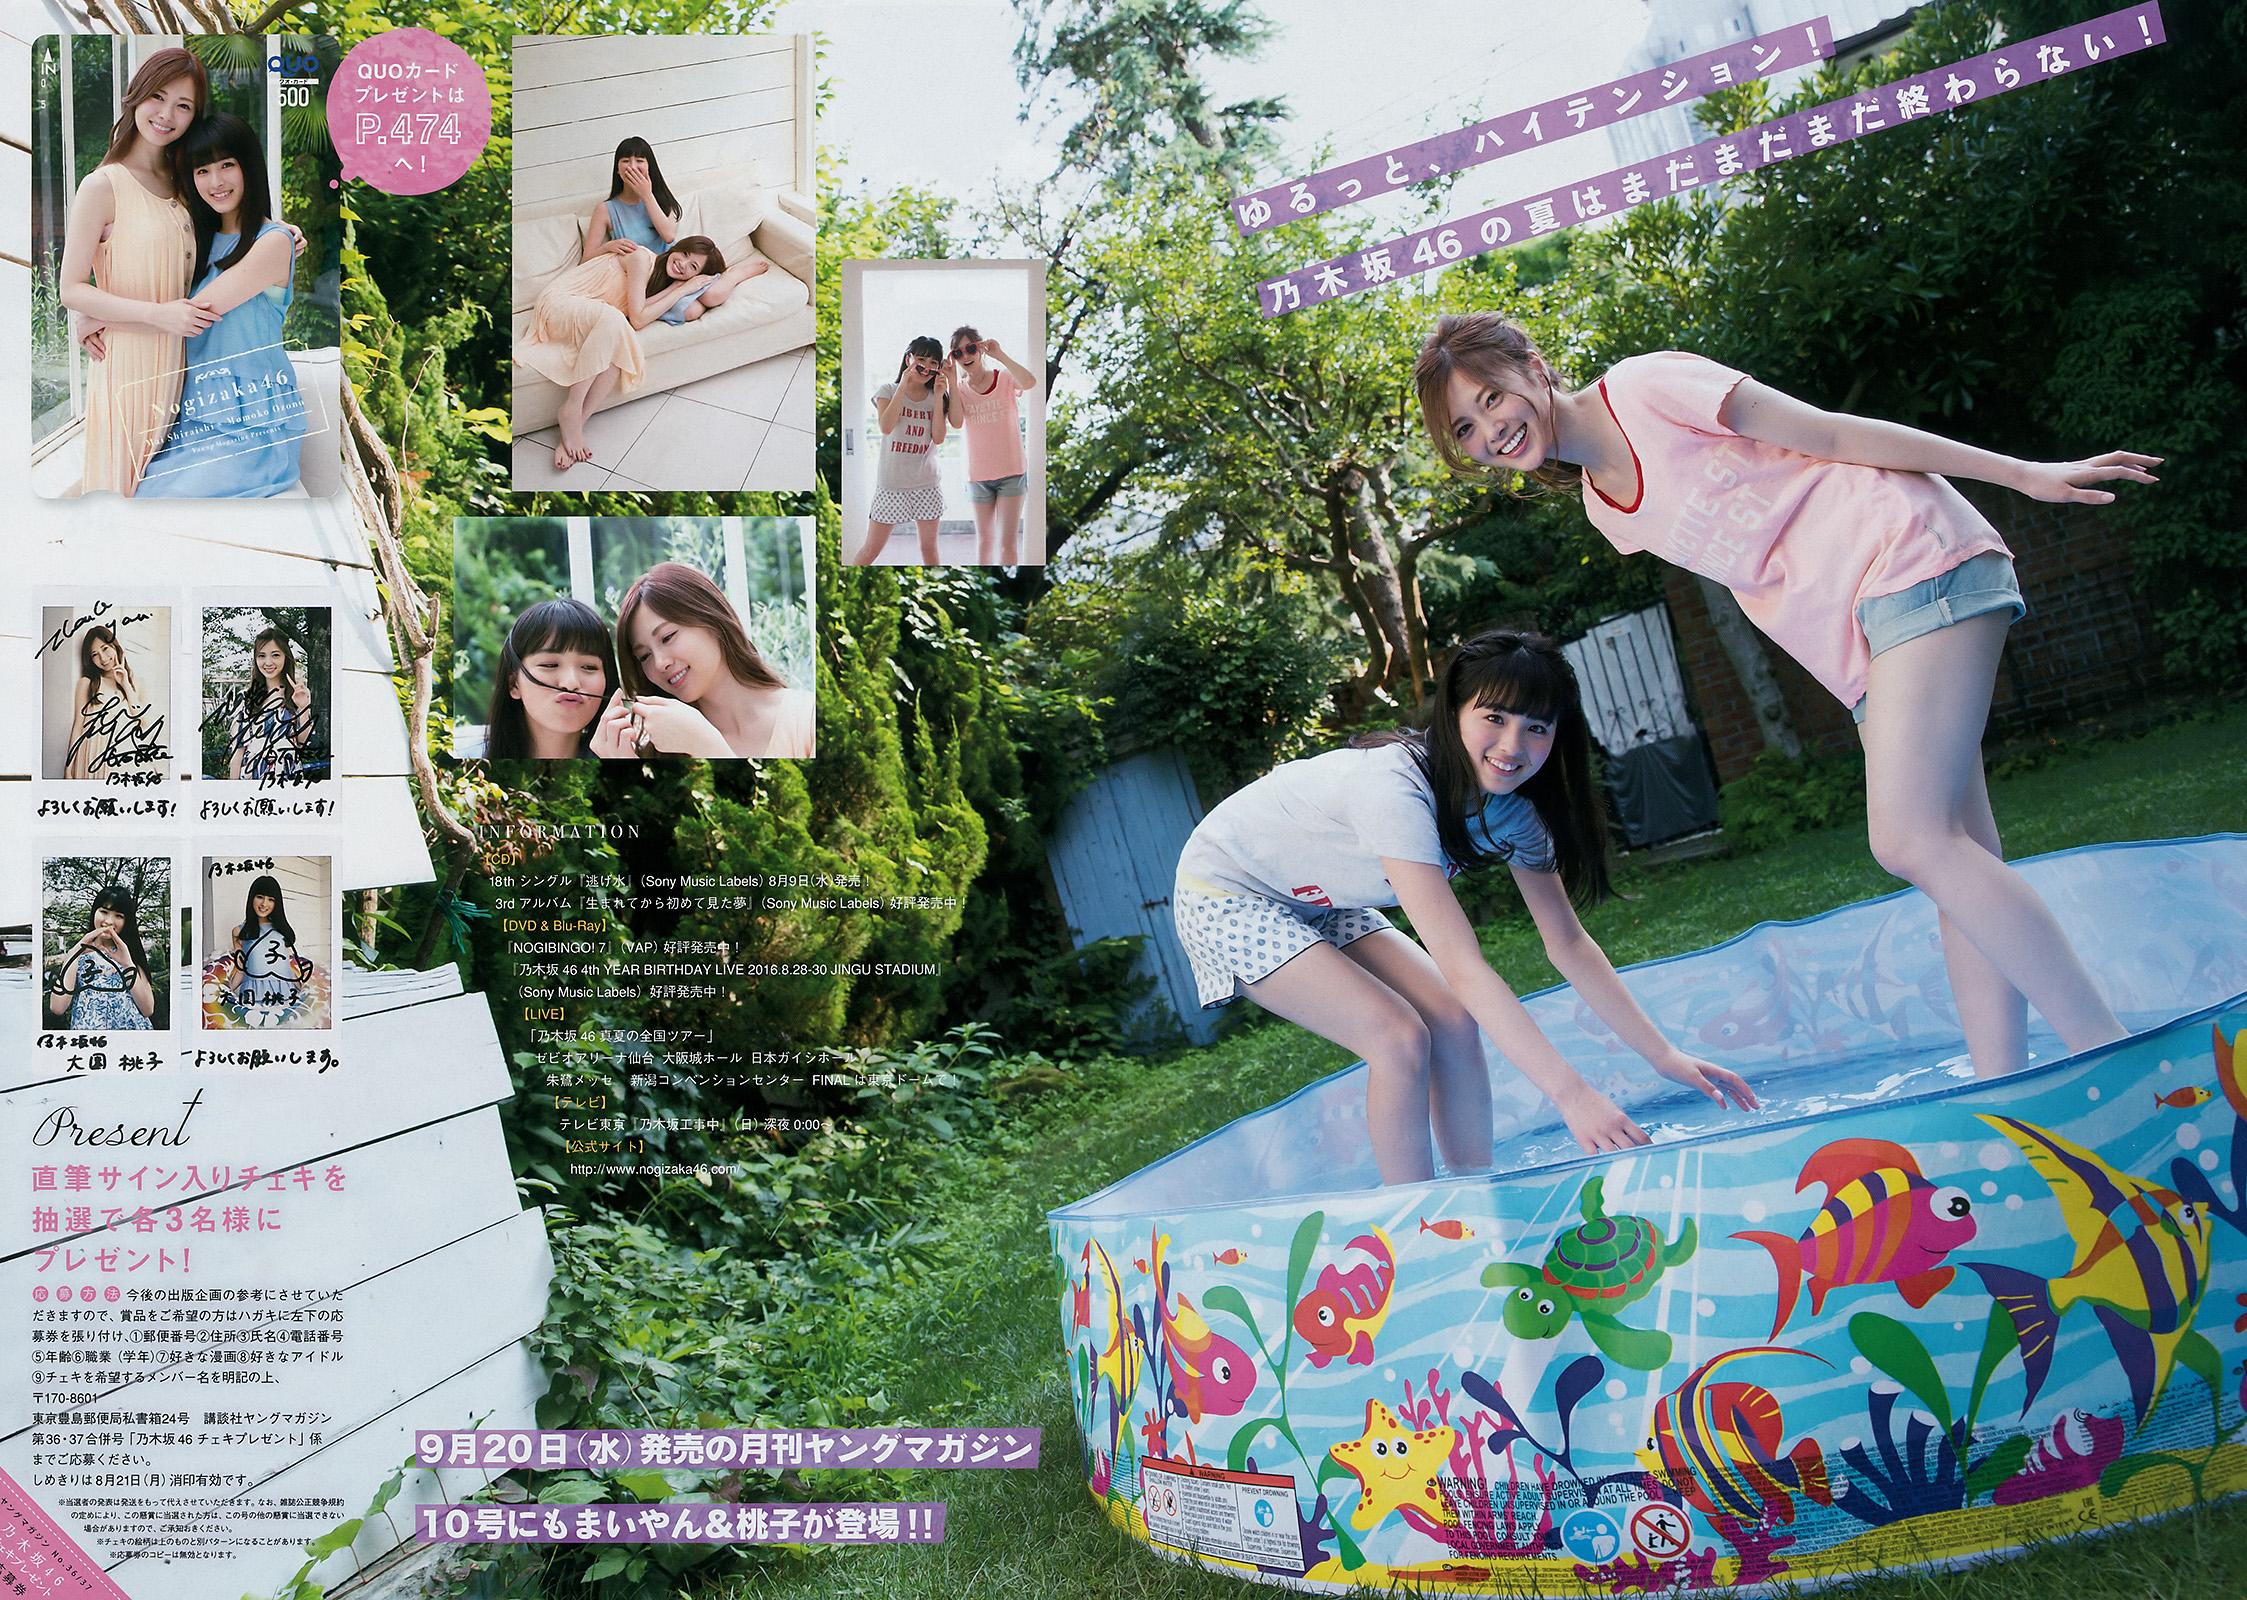 [Young Magazine] 2017 No.36-37 Mai Shiraishi  Momoko Ozono  HKT48 (白石麻衣 大園桃子 HKT48) 07-08-jpg